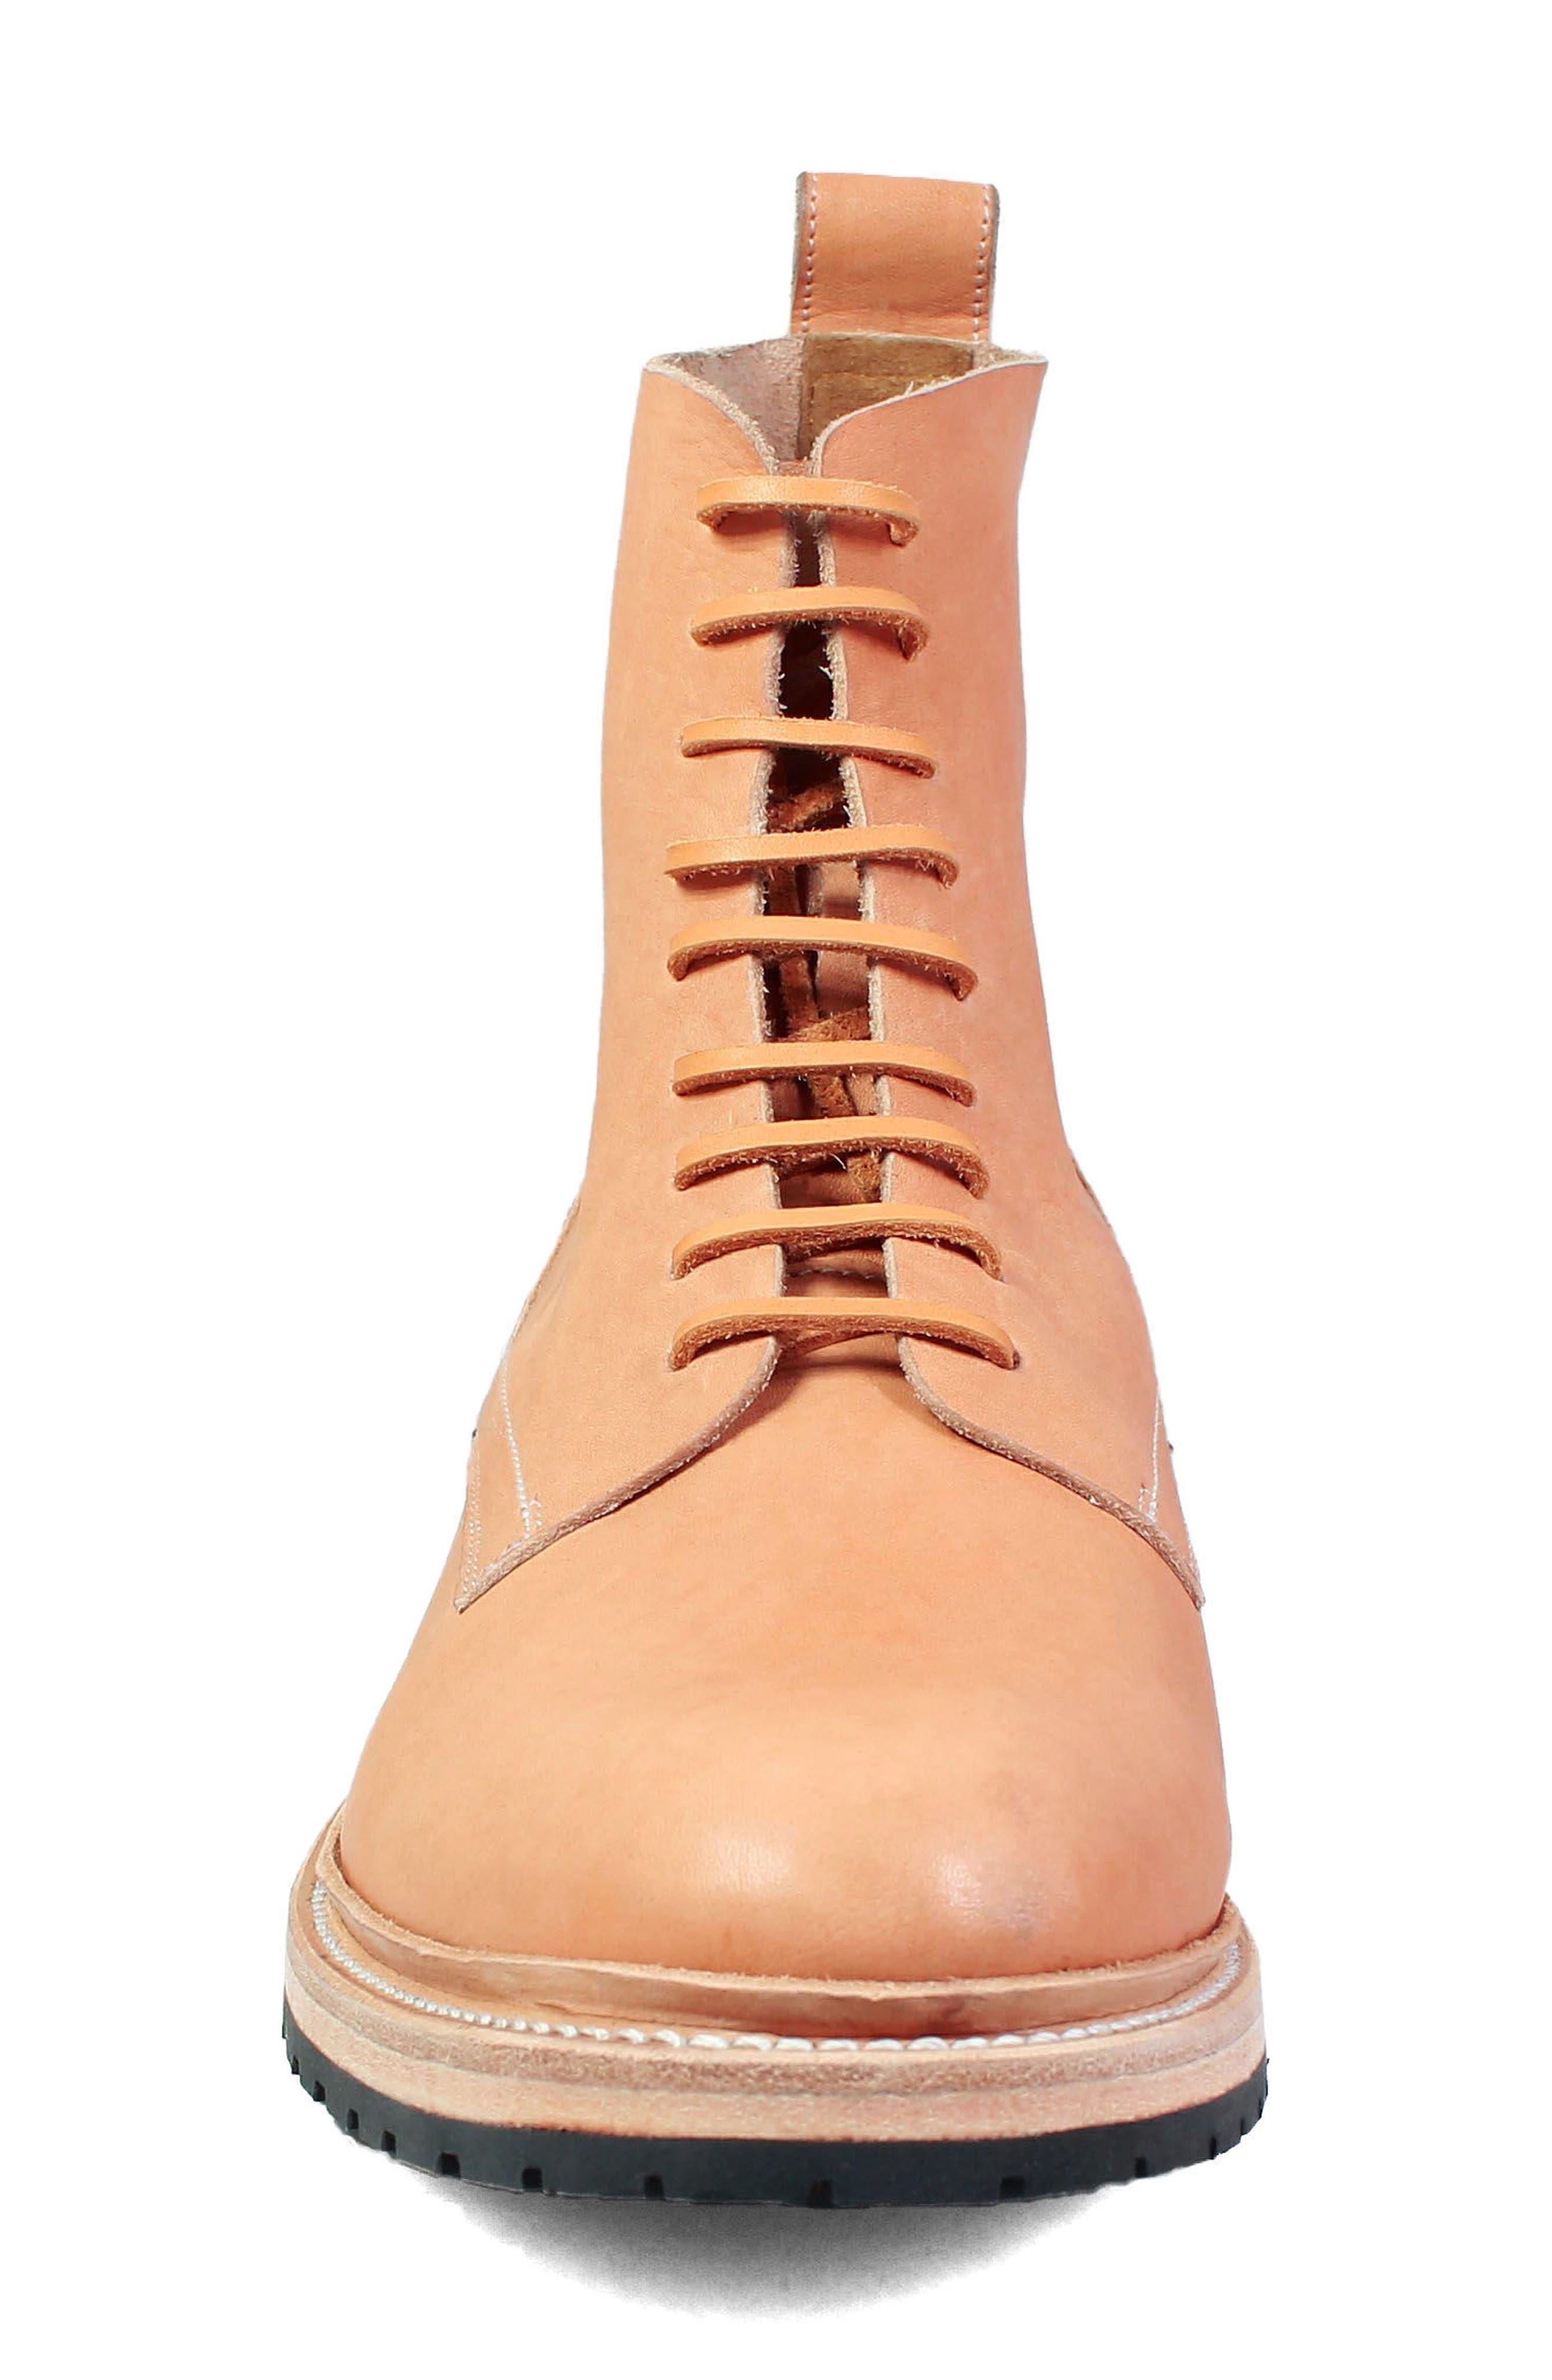 M2 Plain Toe Boot,                             Alternate thumbnail 4, color,                             NATURAL LEATHER